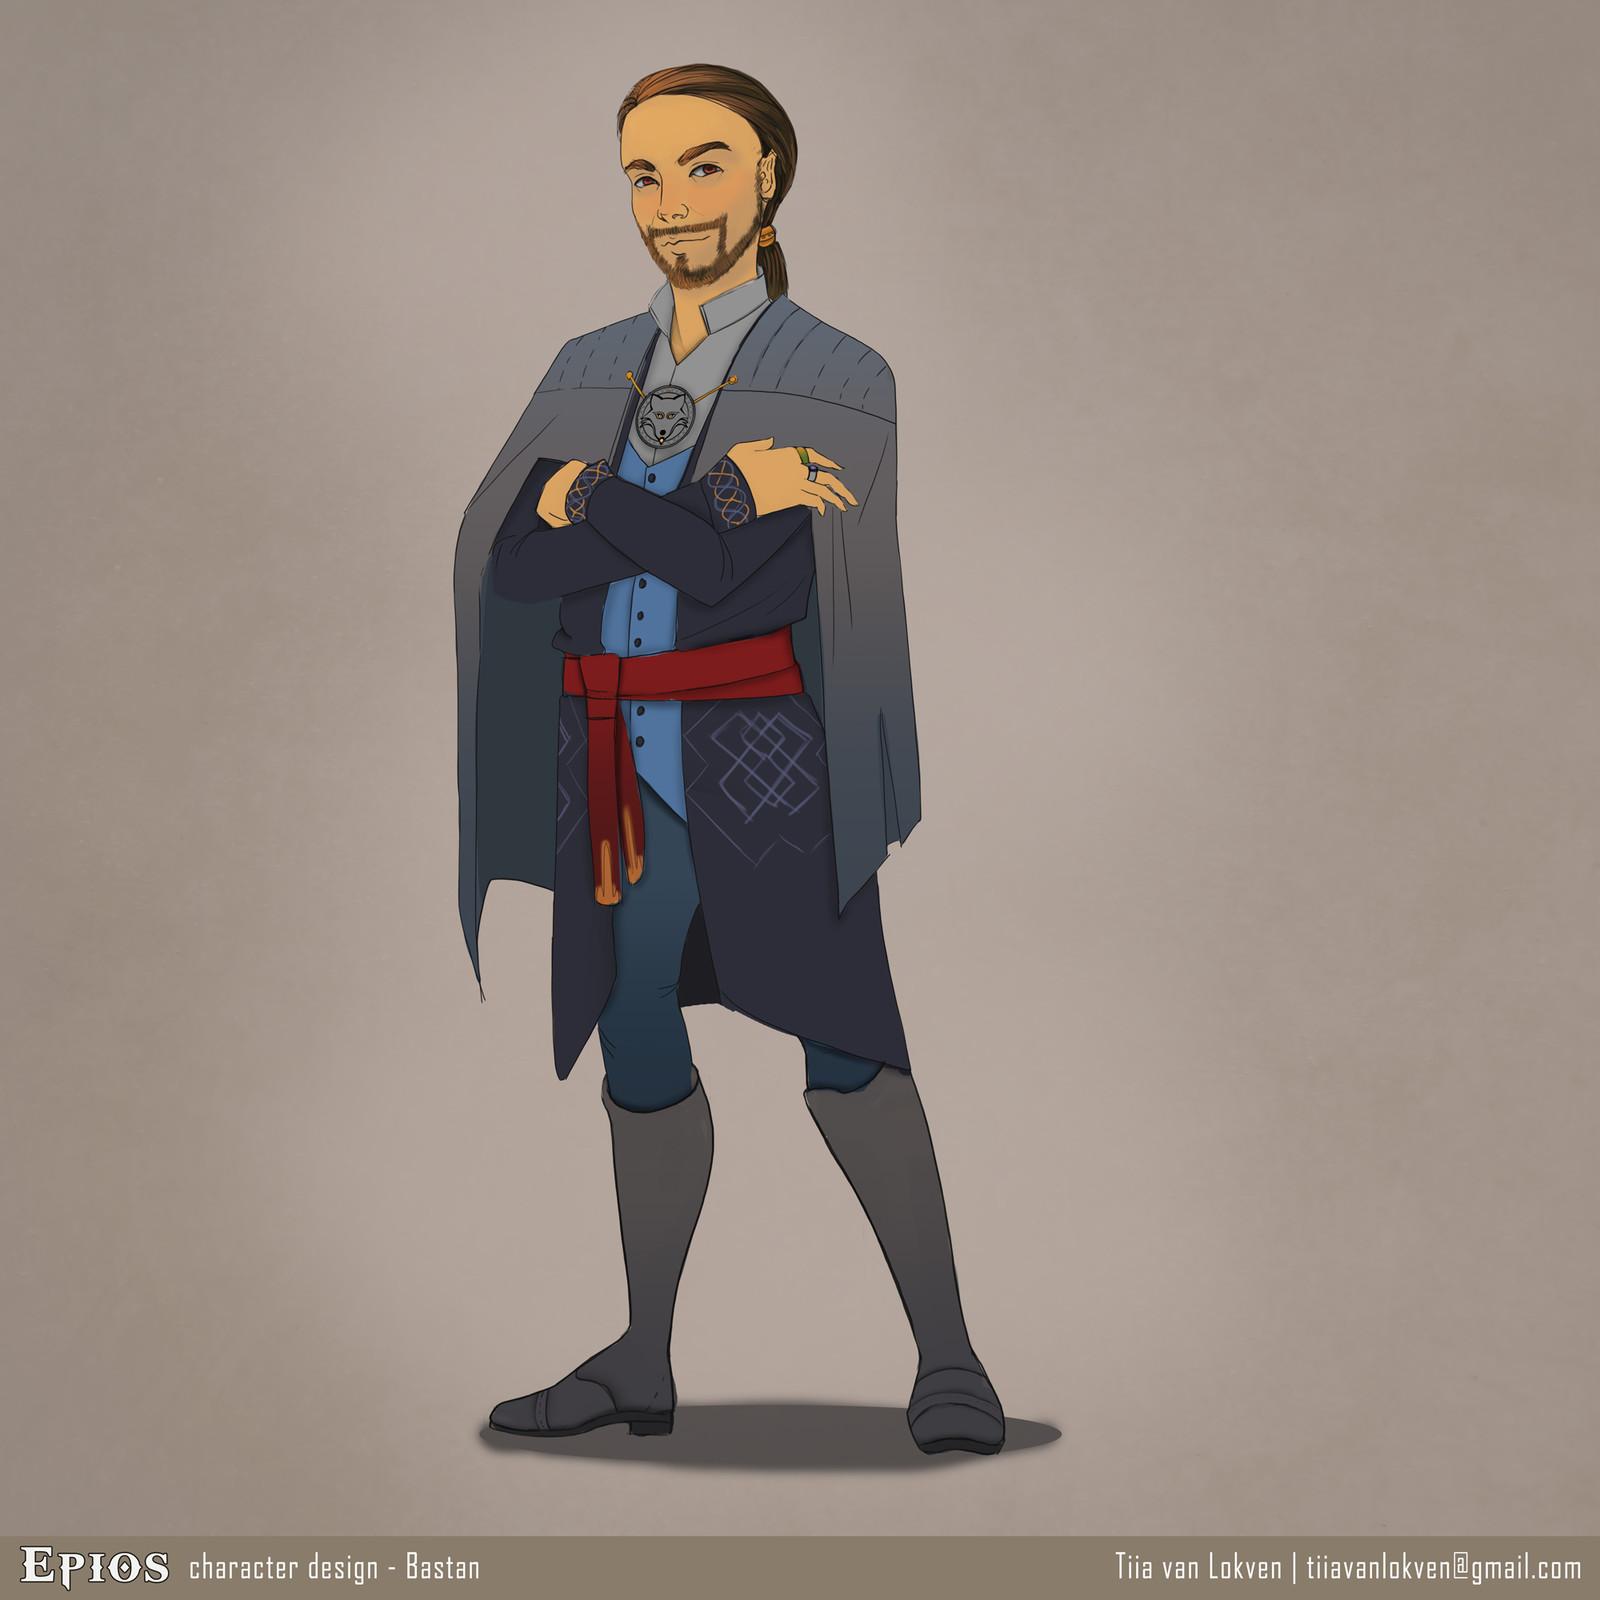 Epios character design - Bastan Whitefang